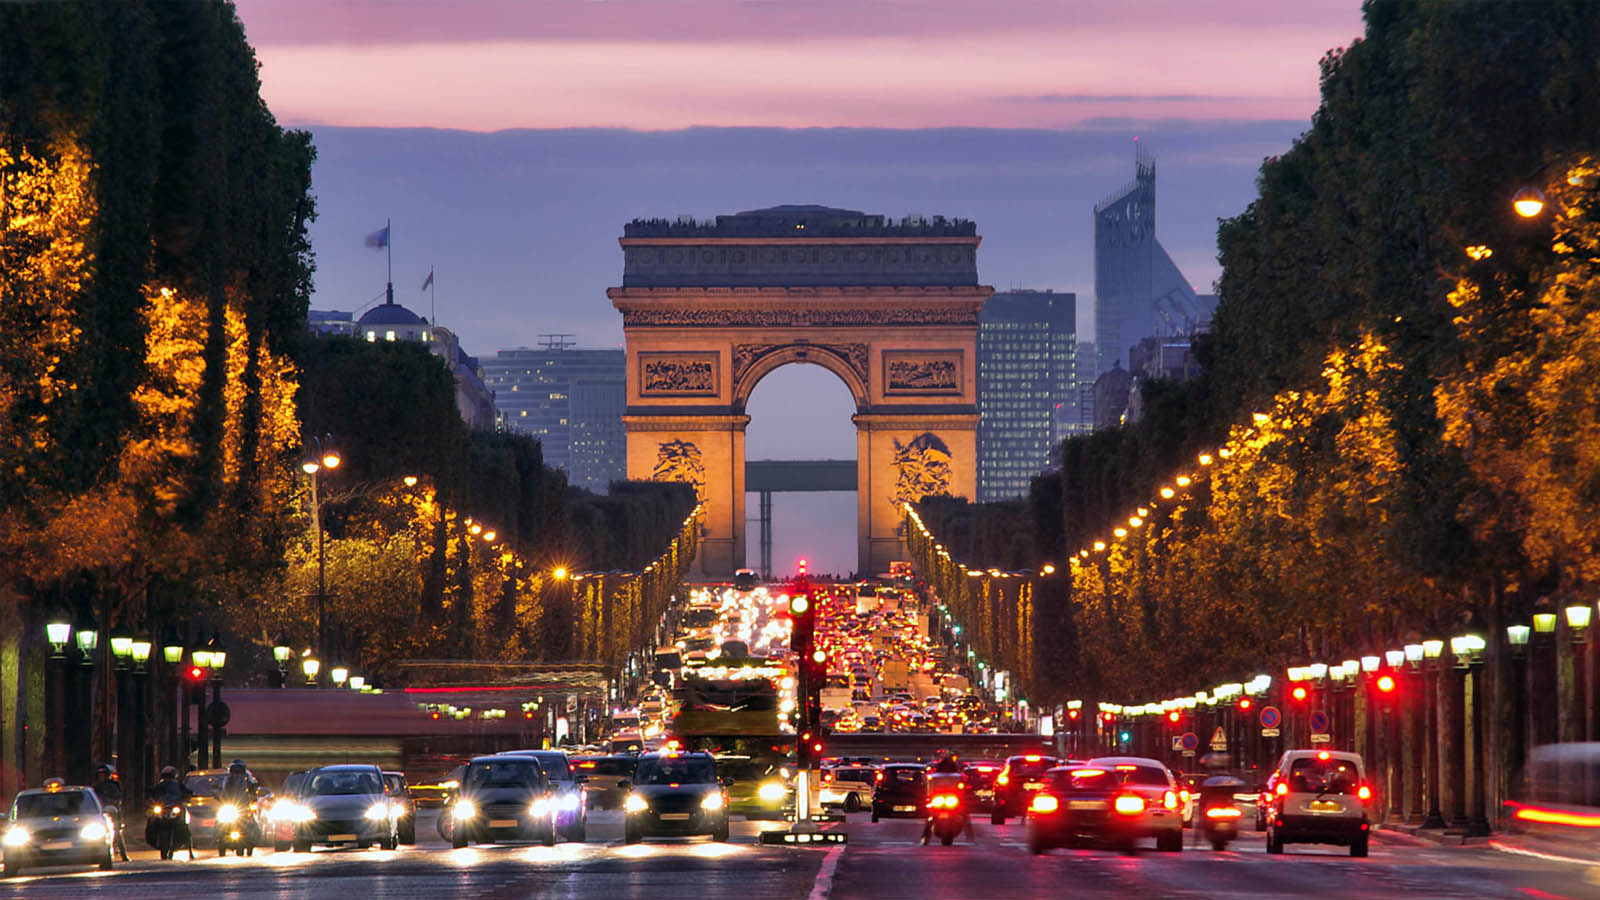 http://www.robertonaldicollection.com/wp-content/uploads/2017/05/Parigi-Offerte.jpg